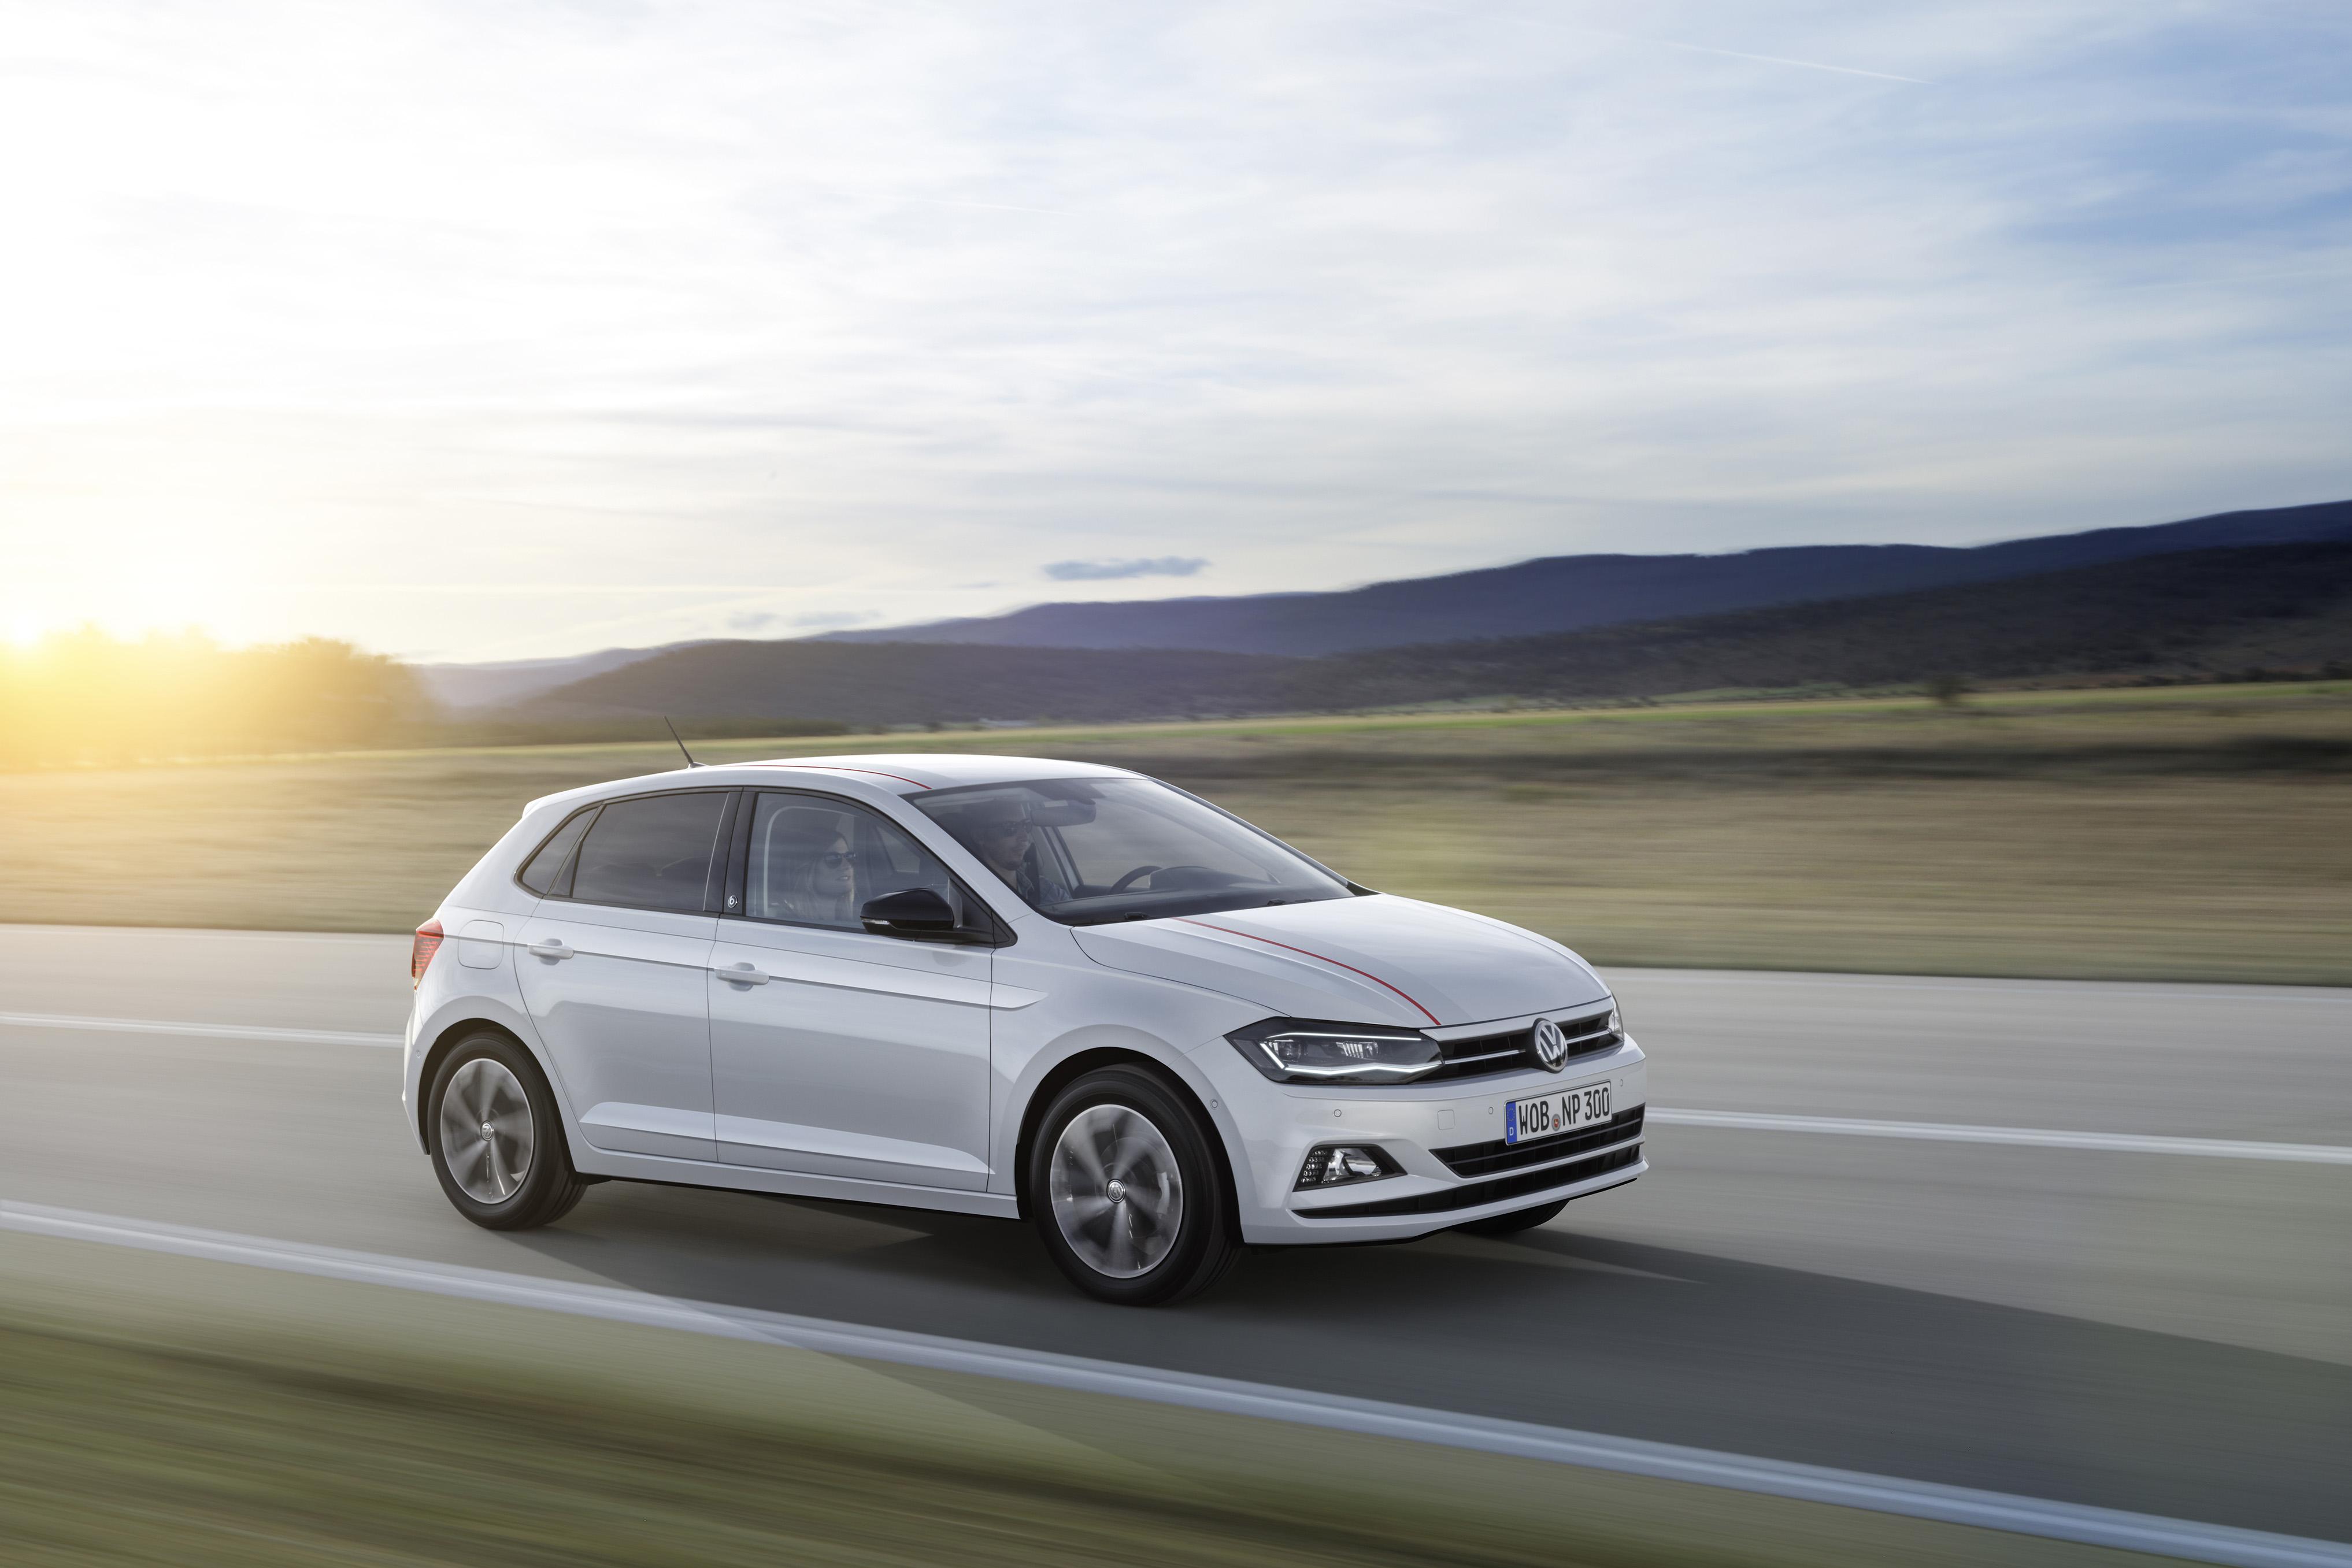 Volkswagen Polo 2018 Fot. mat. prasowe